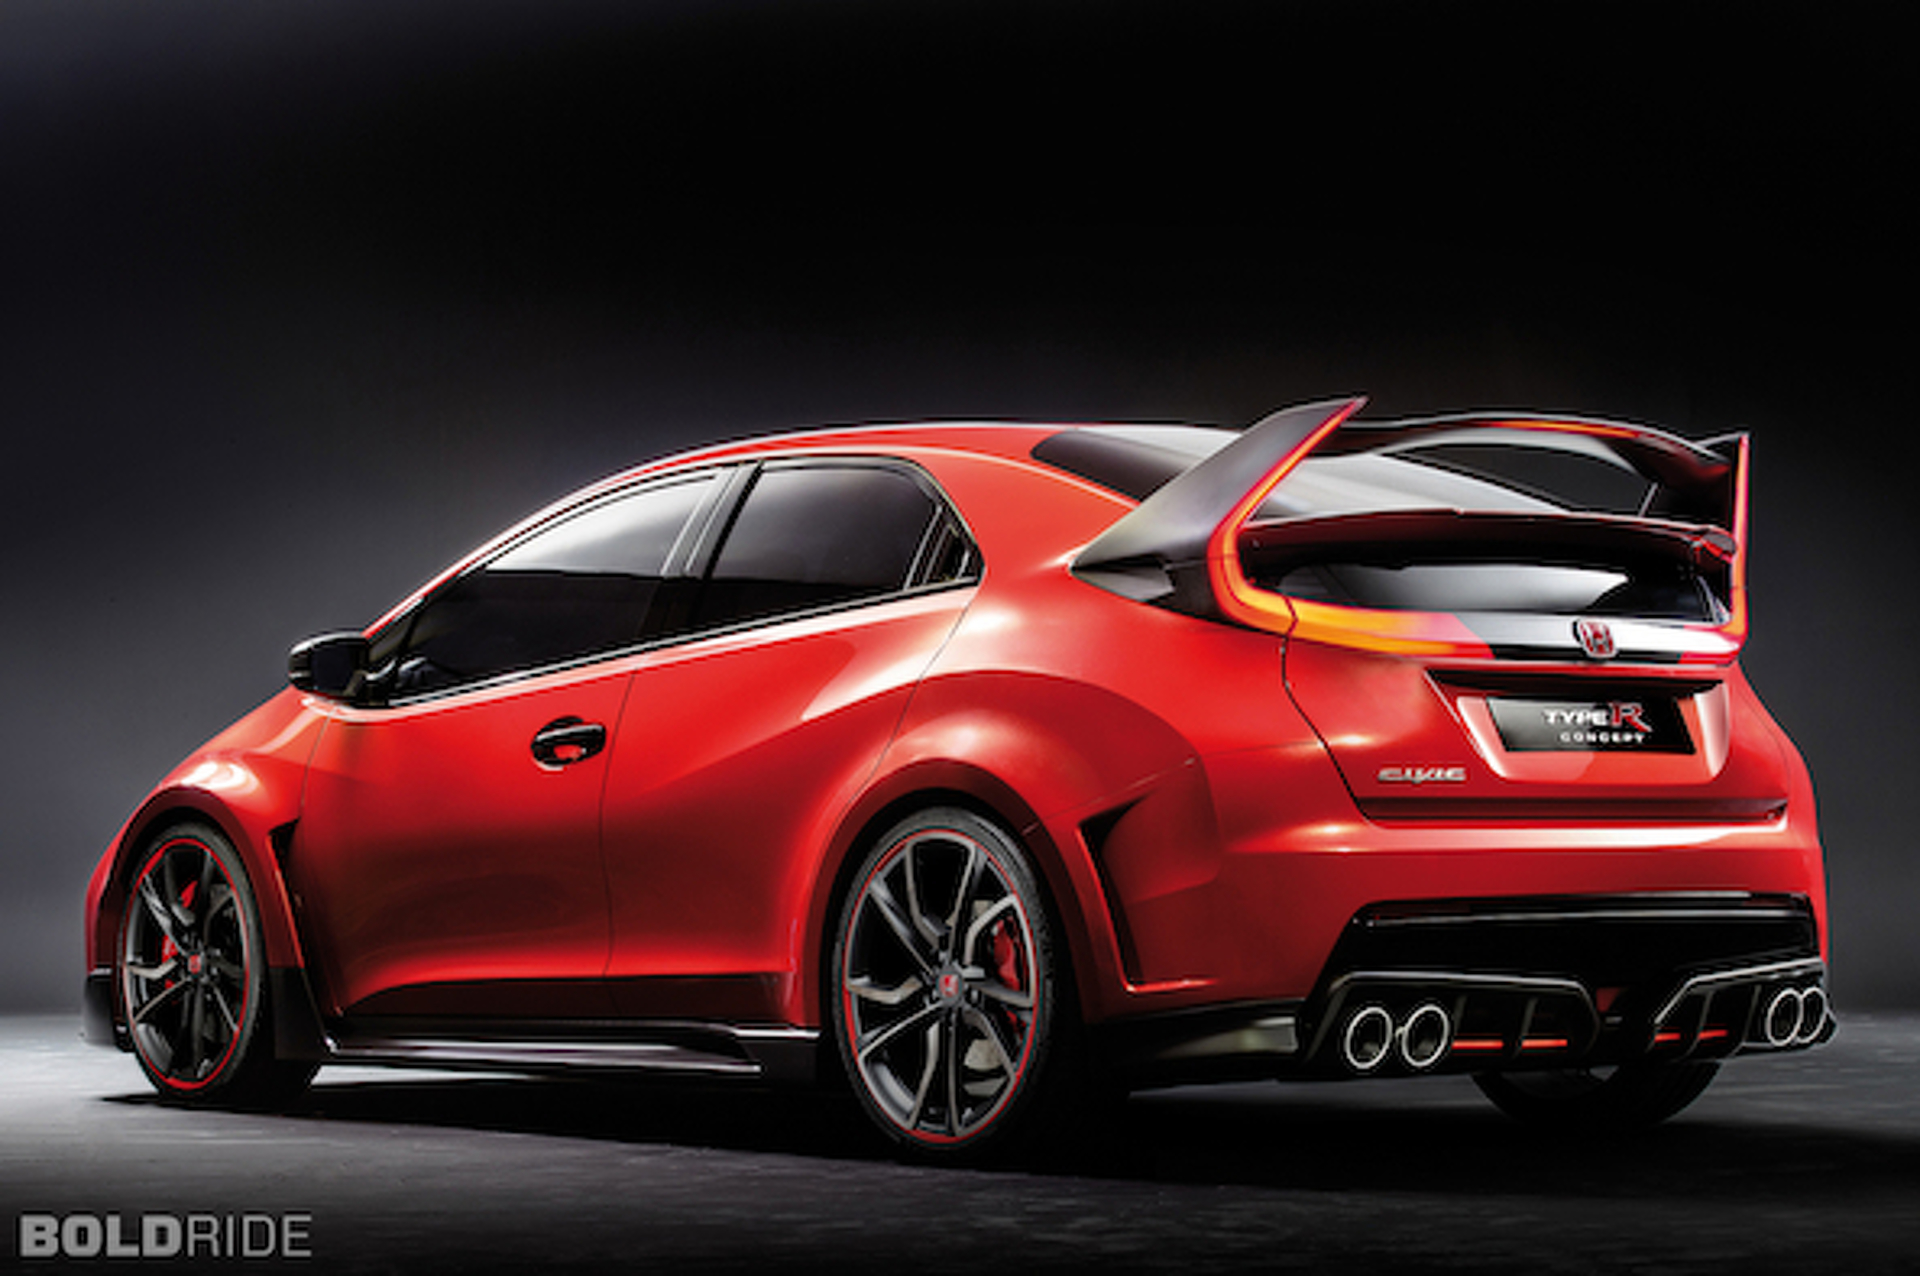 Honda Fans Petitioning to Bring Civic Type R Stateside